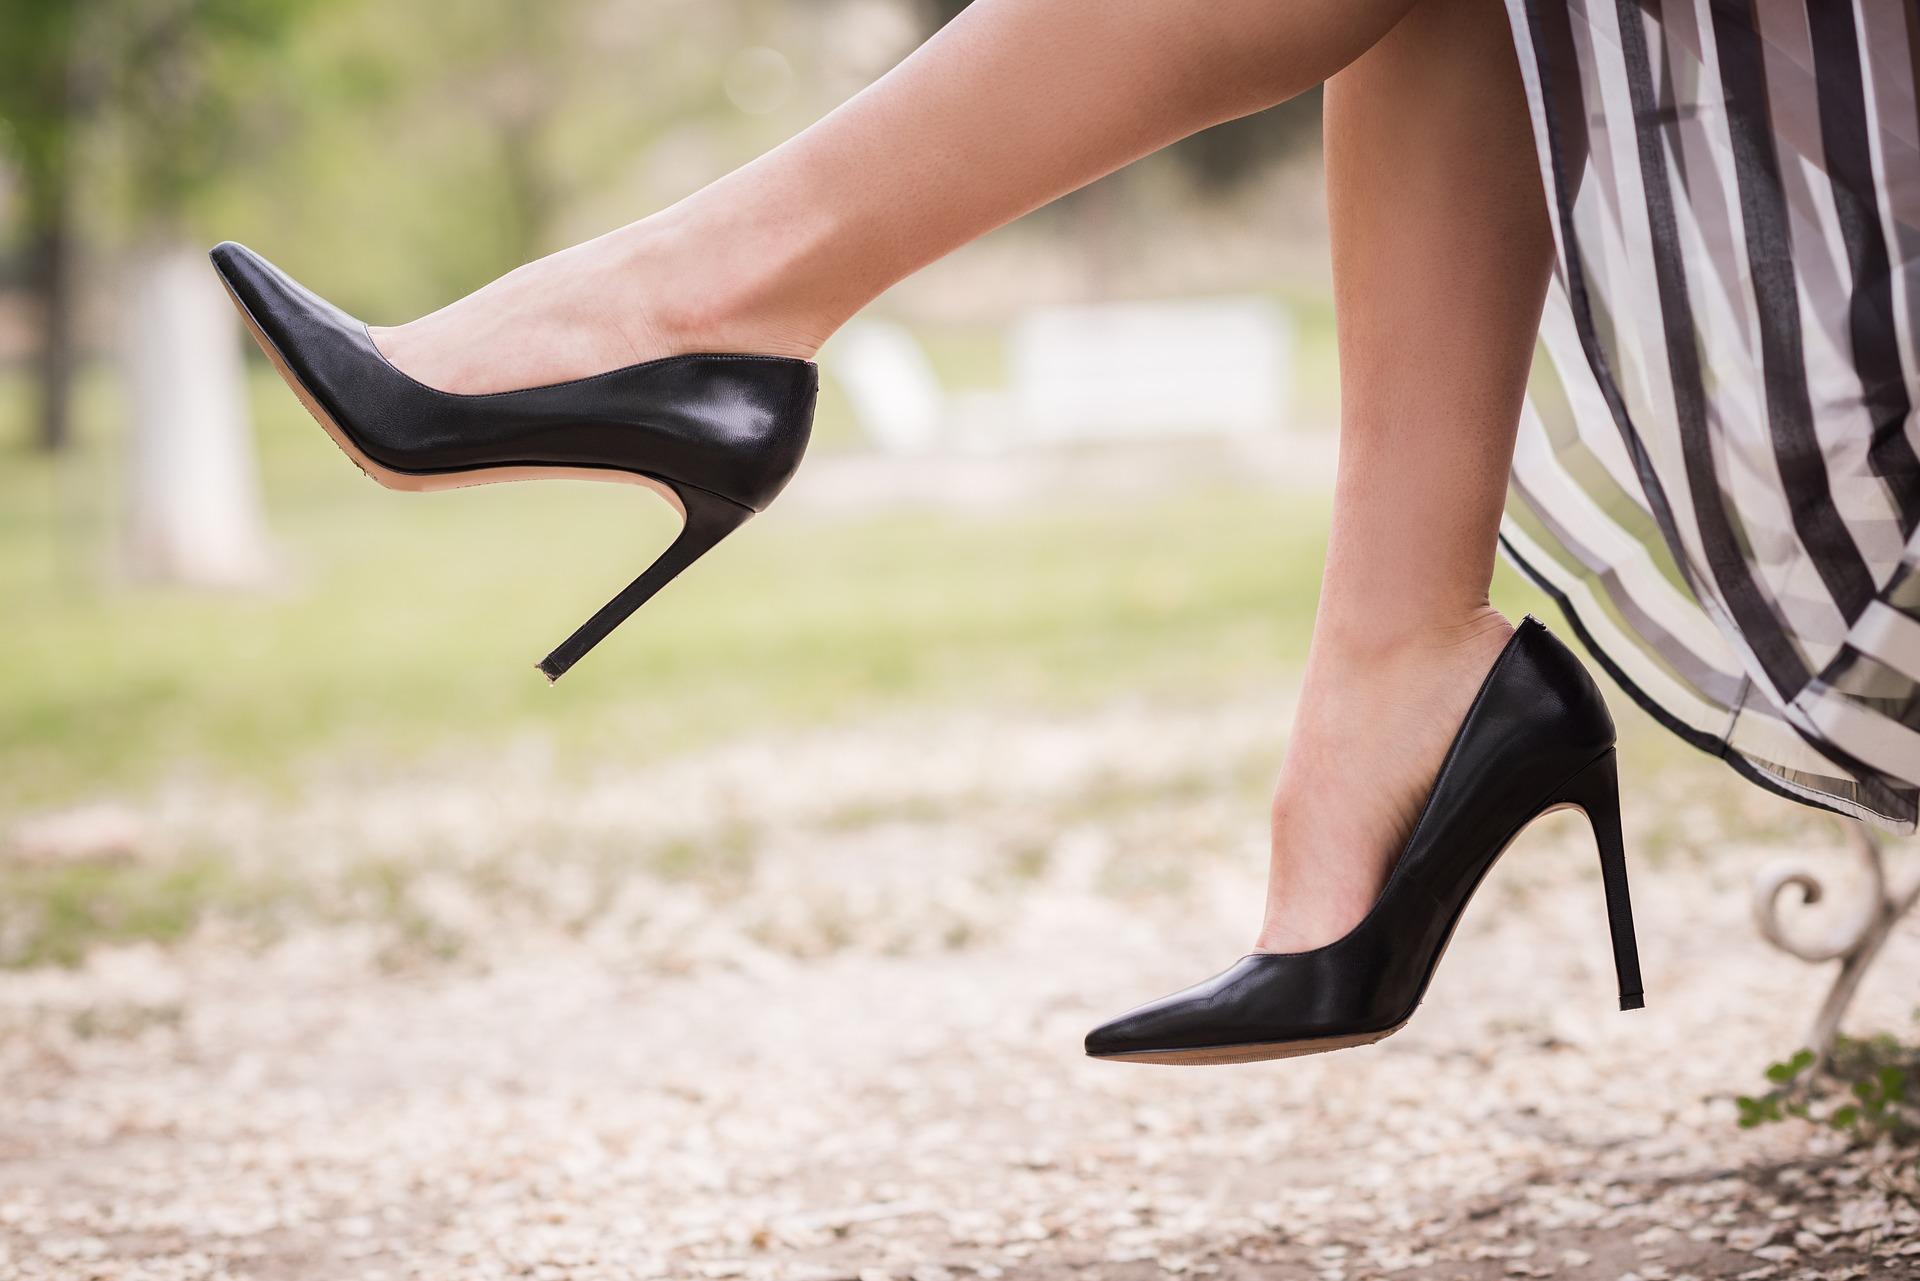 shoe-2538424_1920 (2)